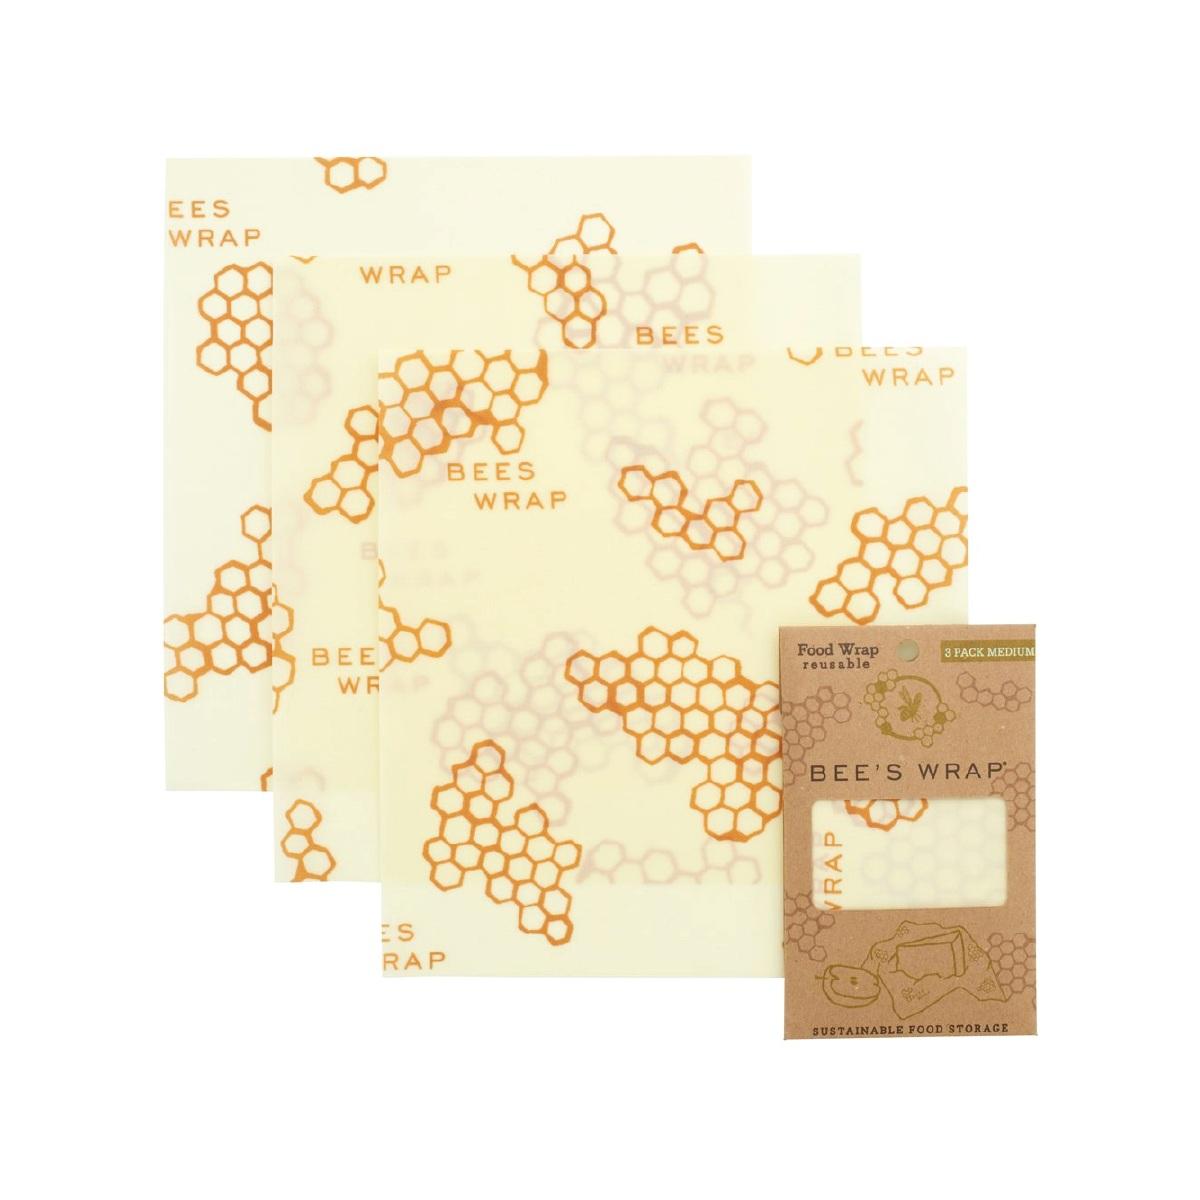 beeswrapmedium-01.png